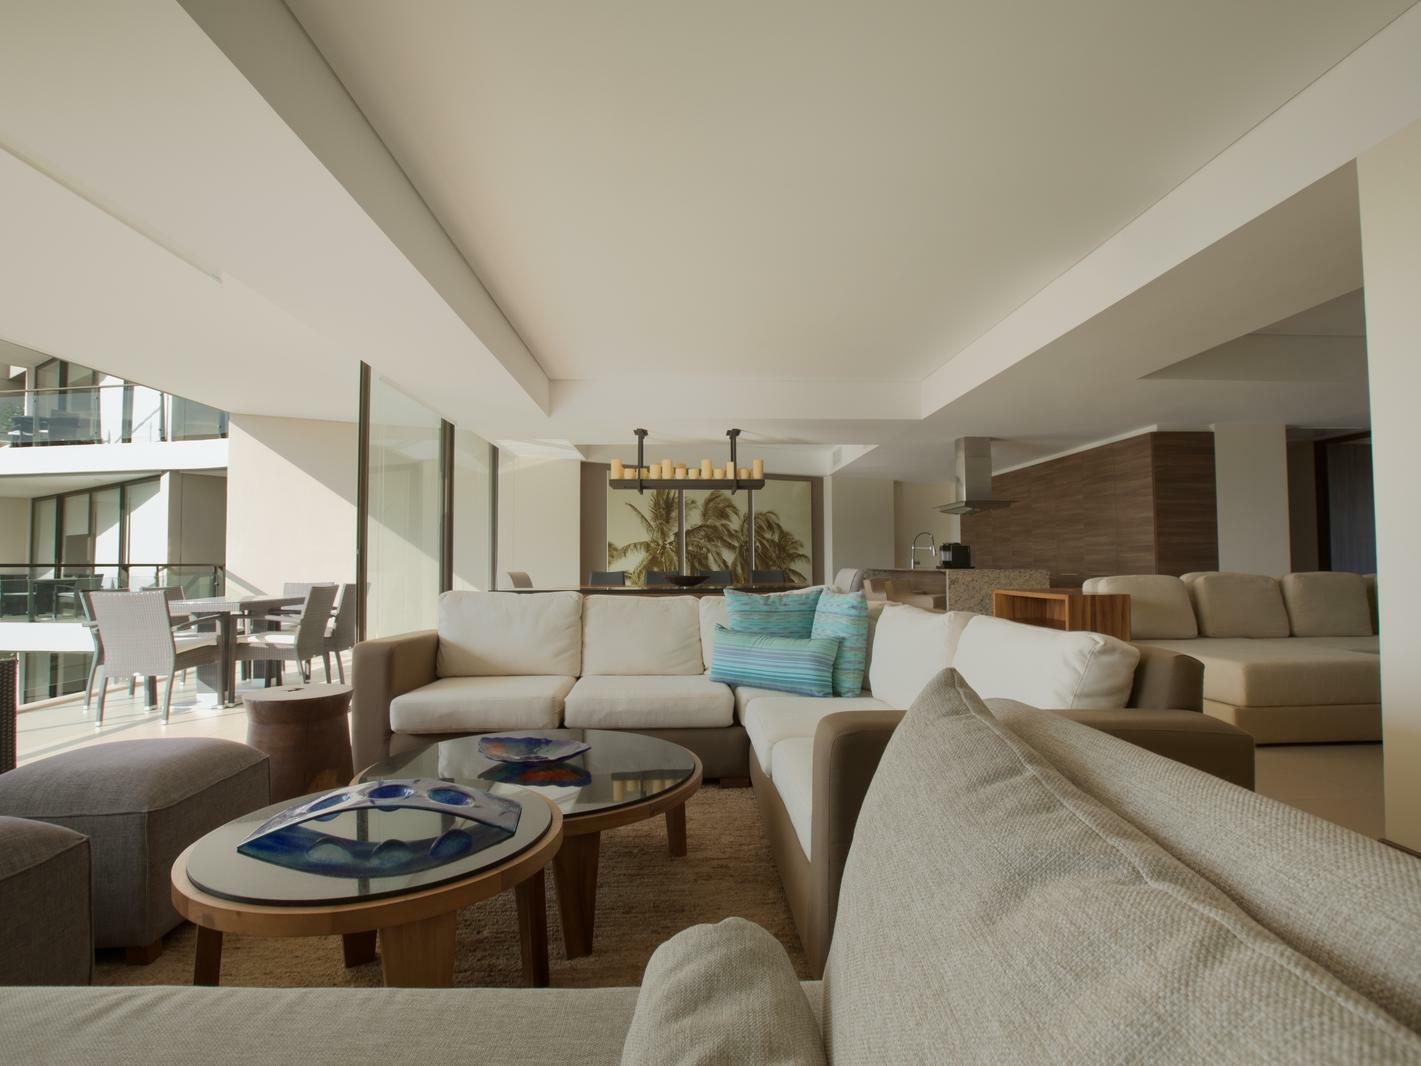 Grand Club Marina Condo at Live Aqua Private Residences